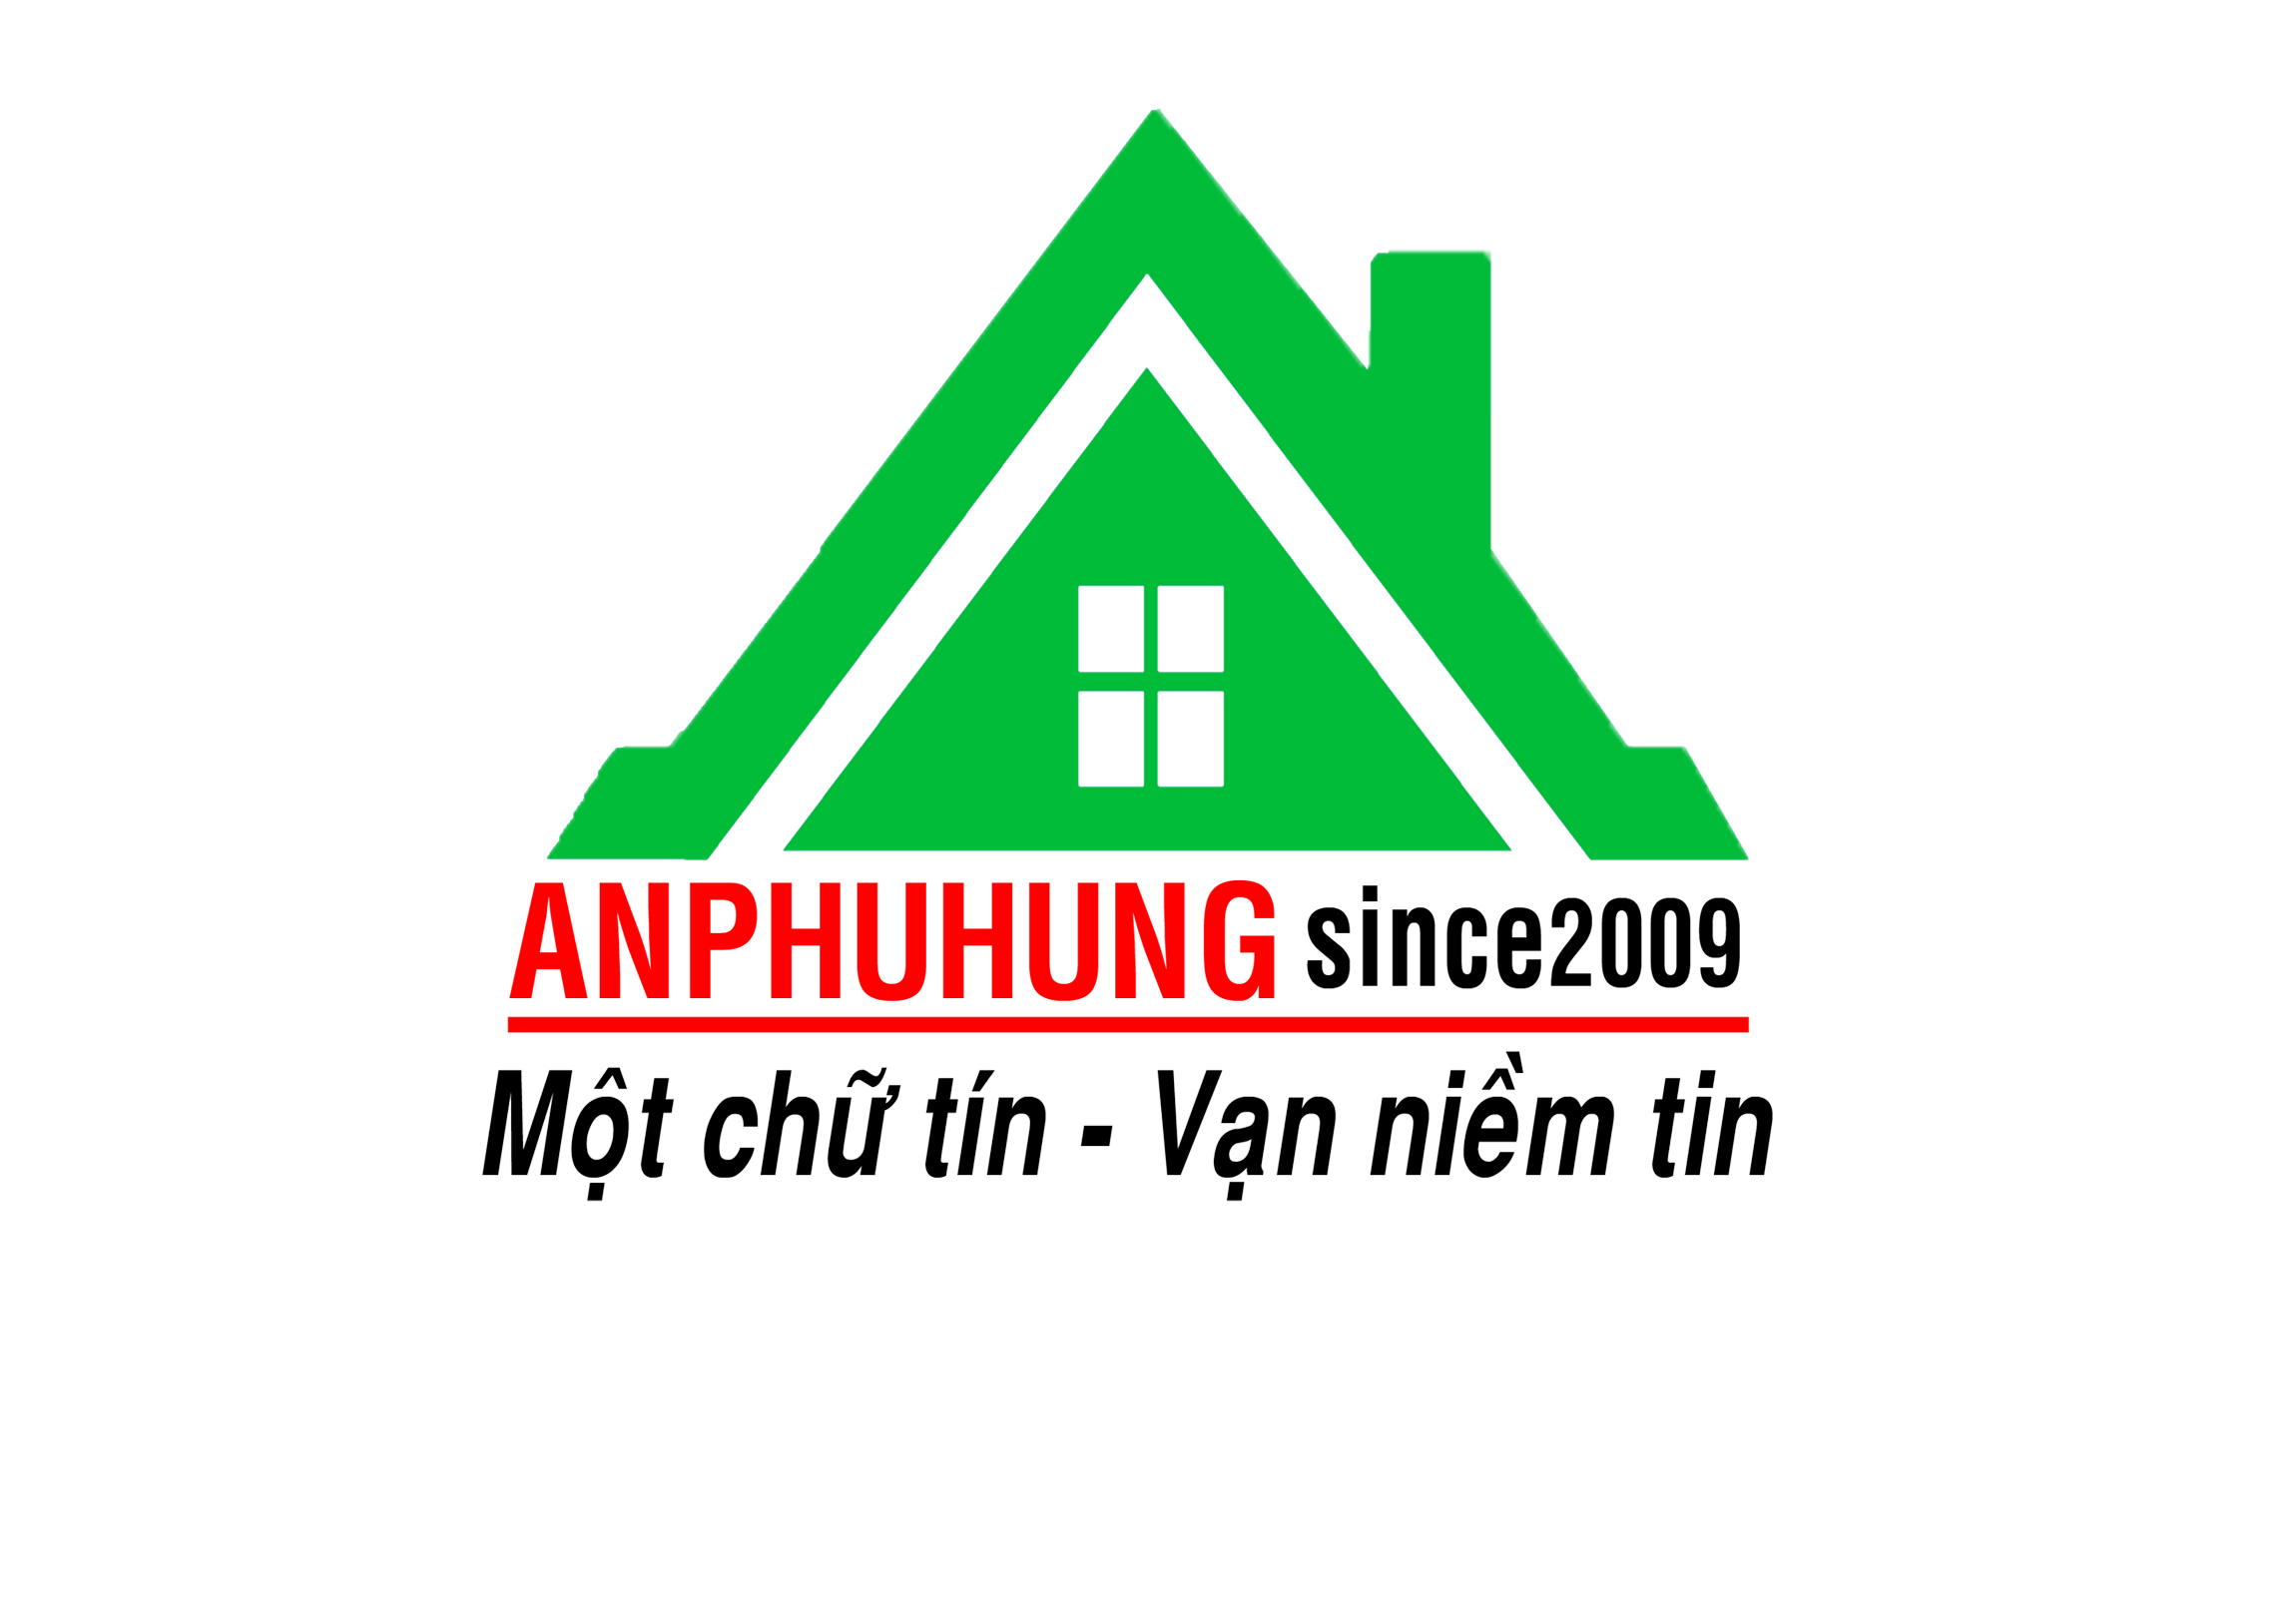 anphuhungcons